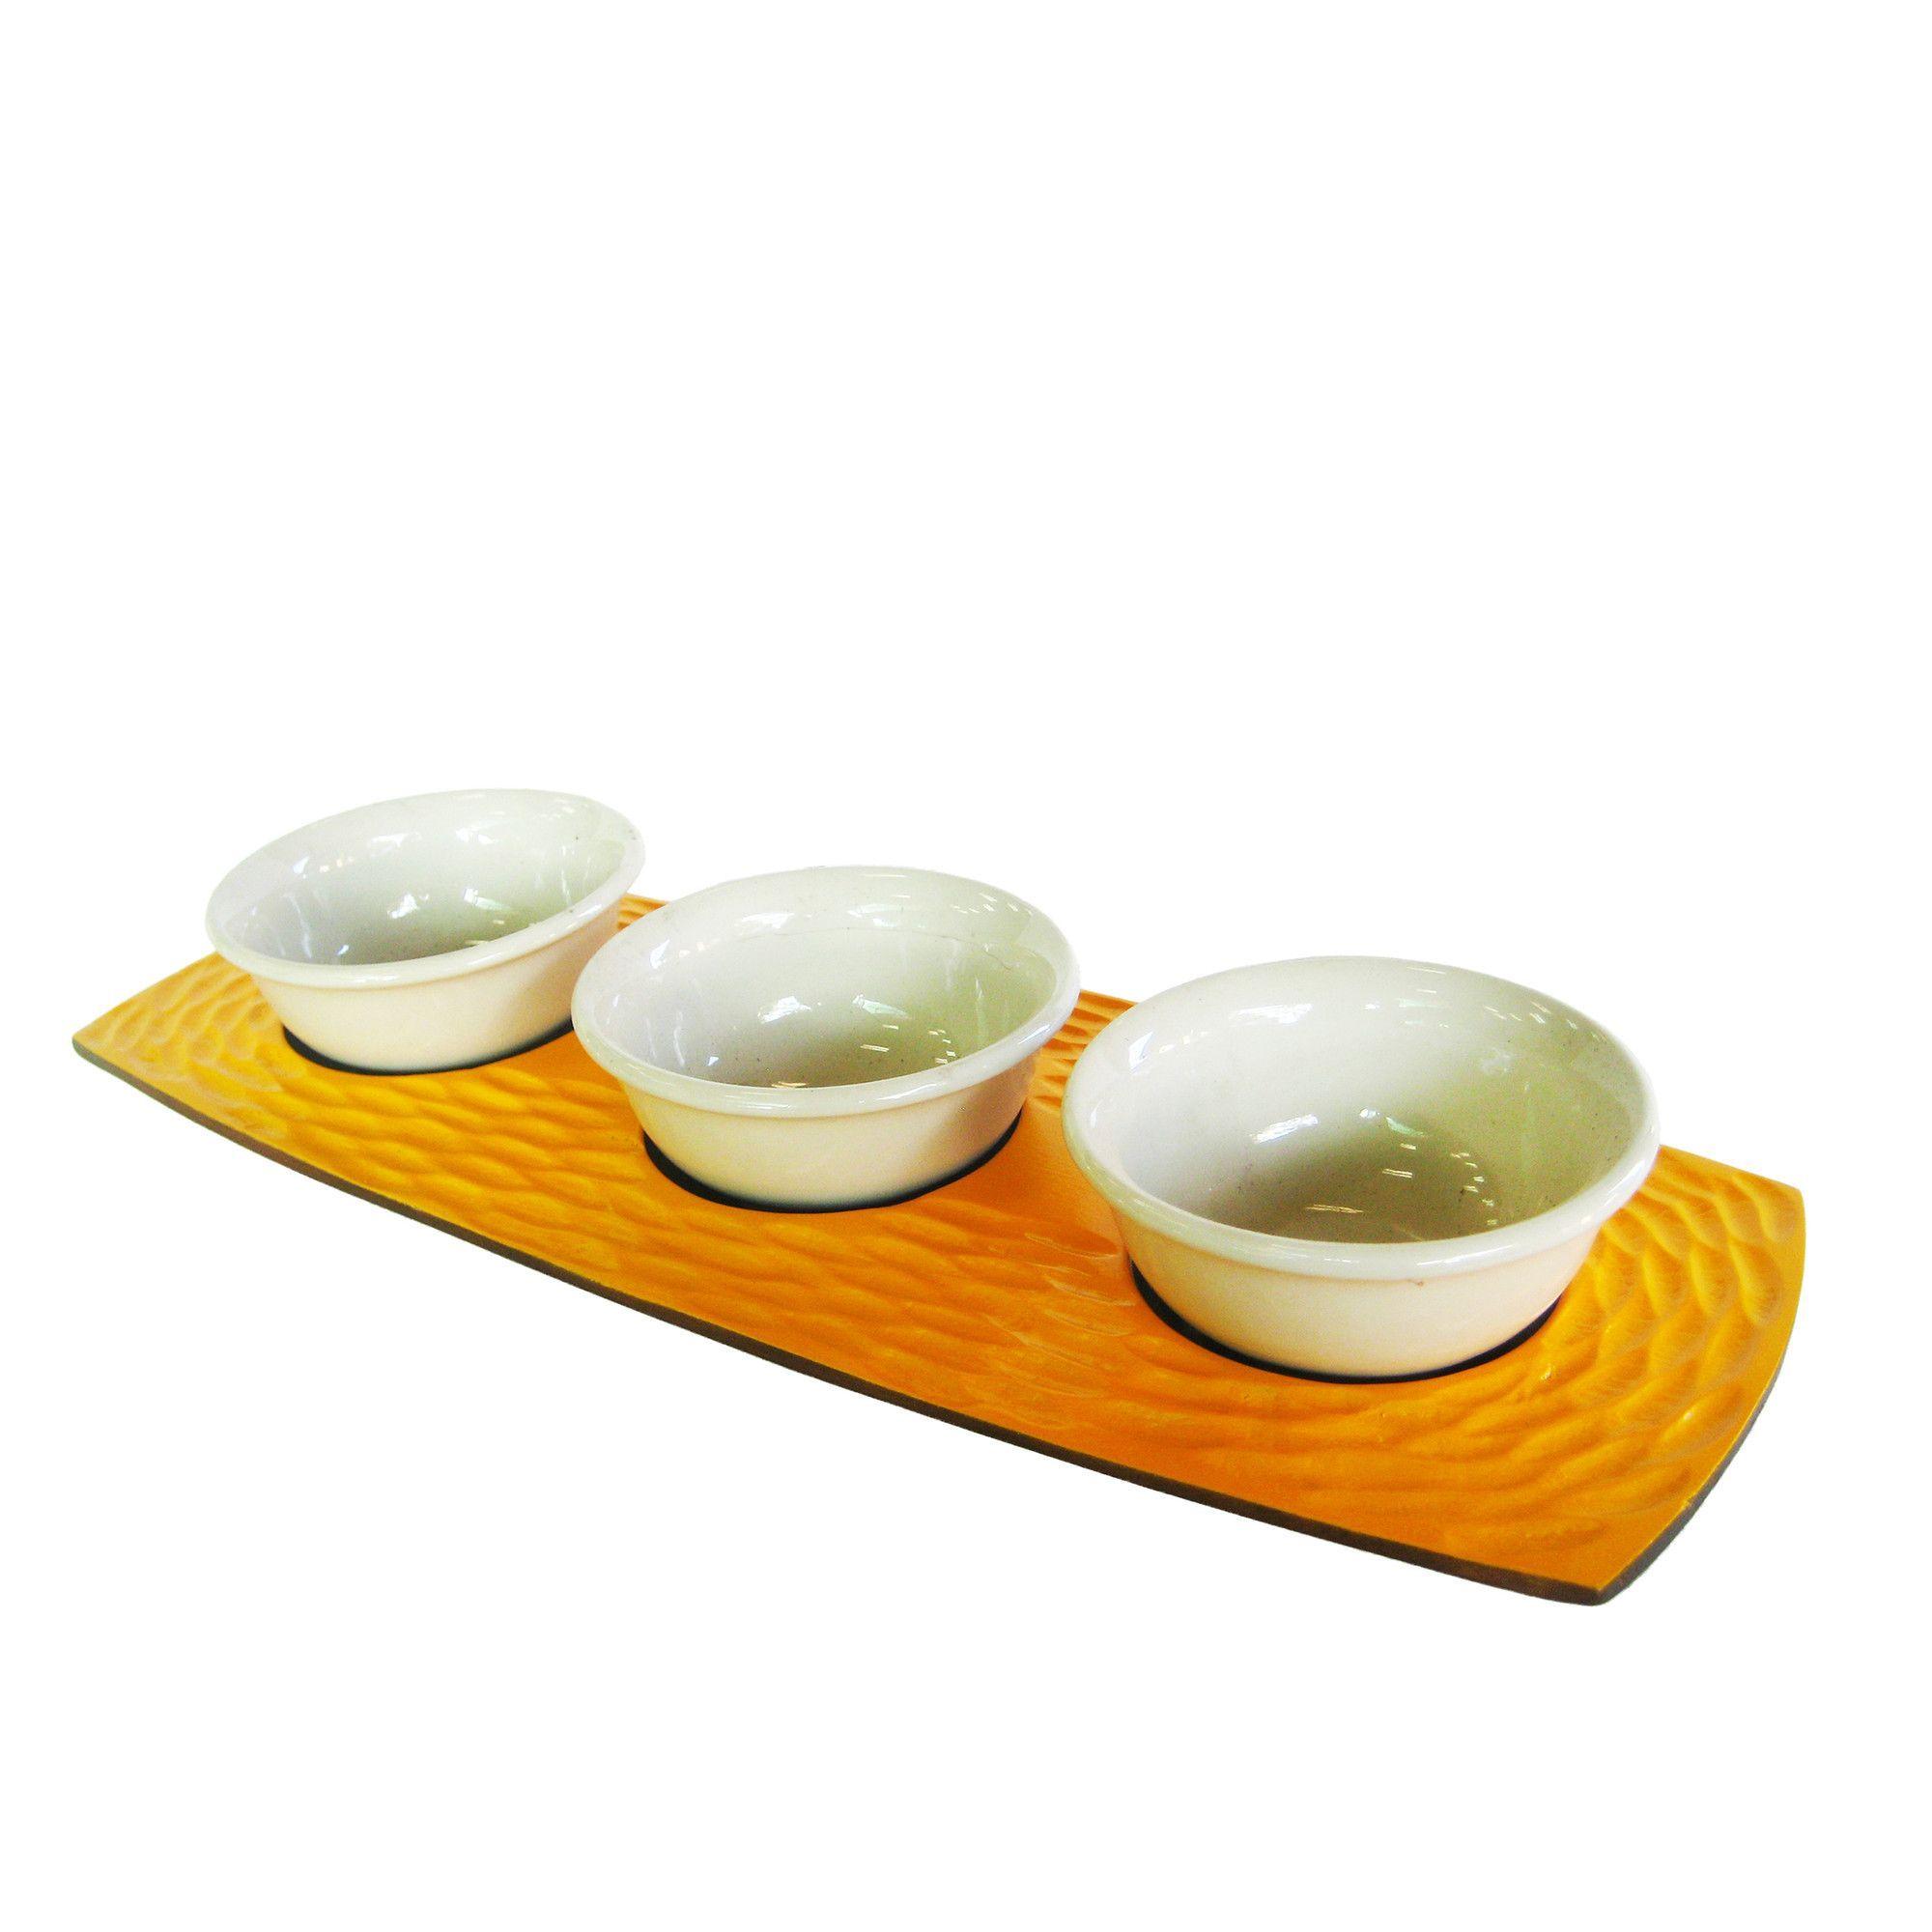 Honeycomb 4 Piece Serving Bowl Set